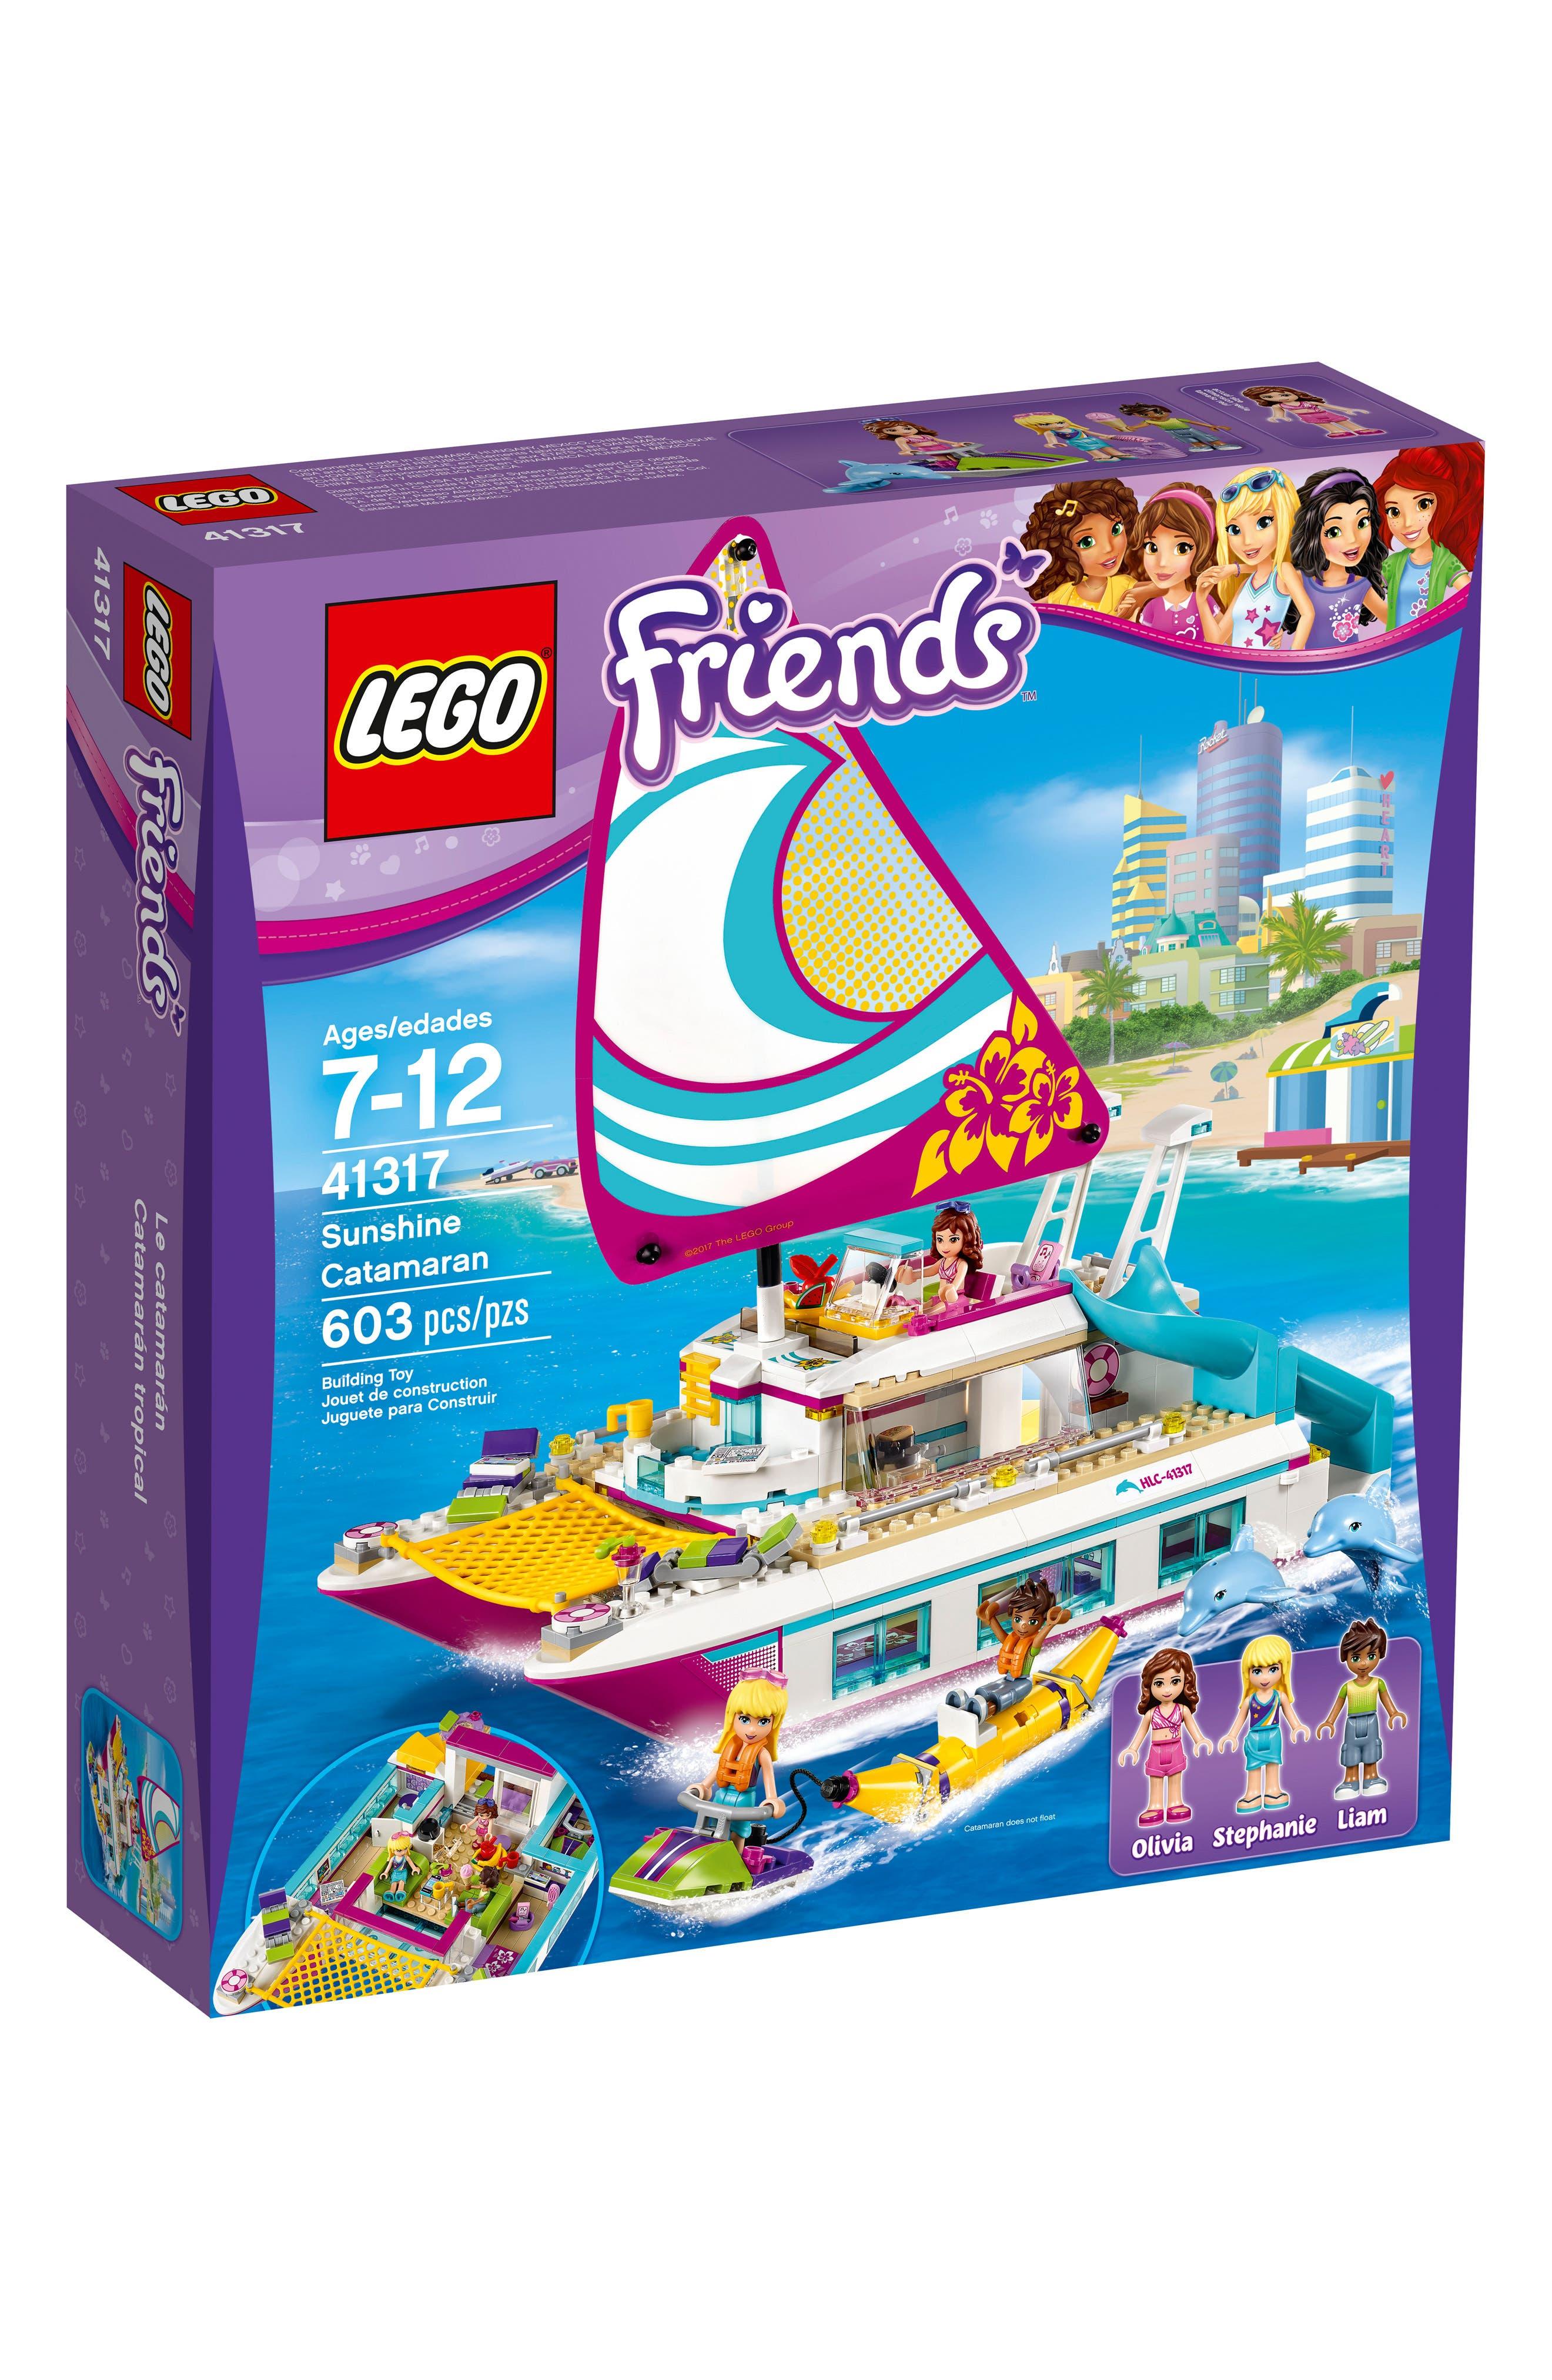 Sunshine Catamaran Play Set - 41317,                         Main,                         color, 650